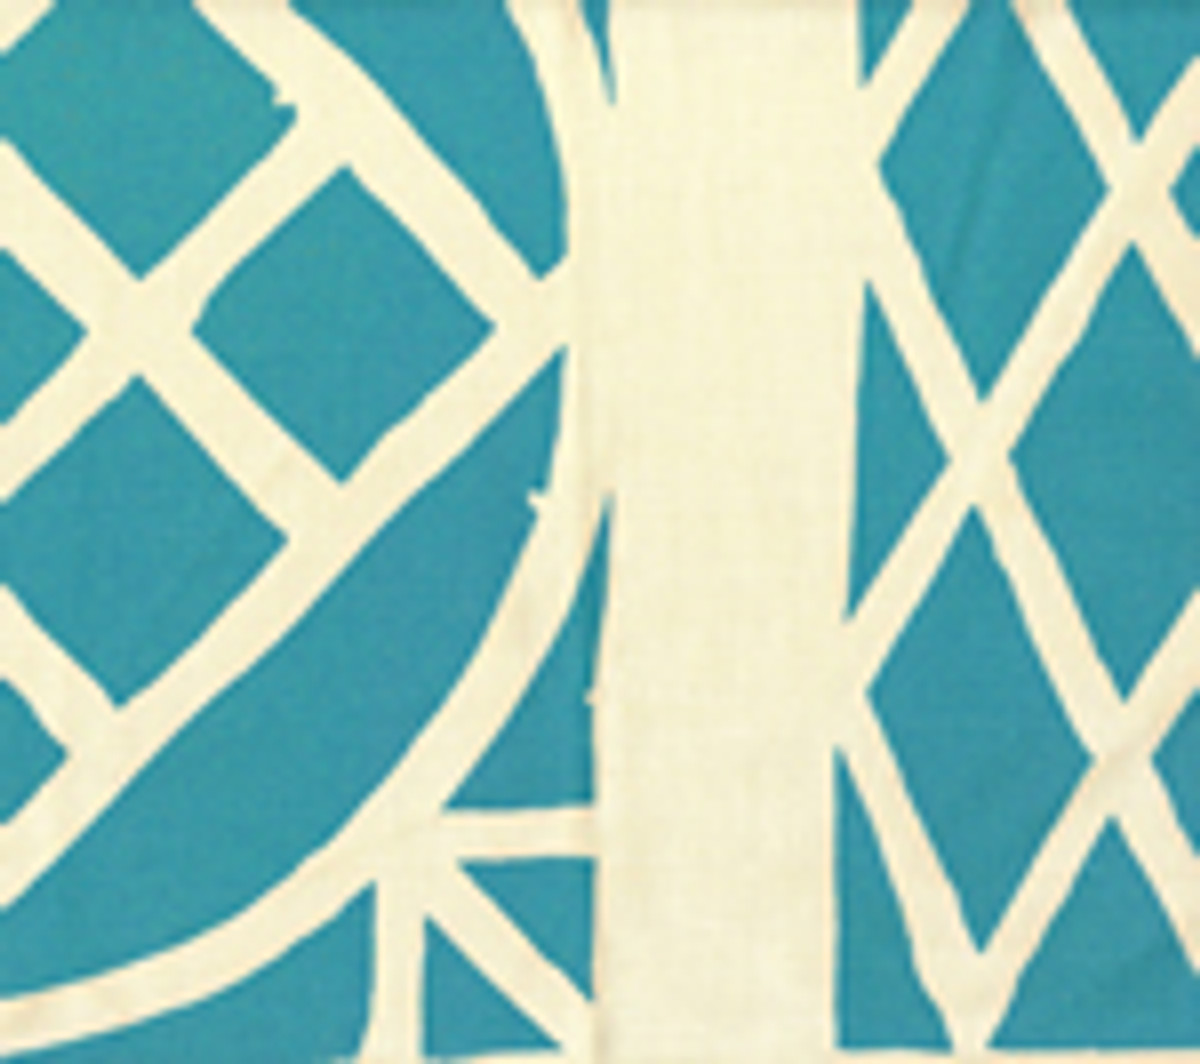 Trellis Background Wallpaper: Quadrille China Seas Lyford Trellis Wallpaper 6020W 03